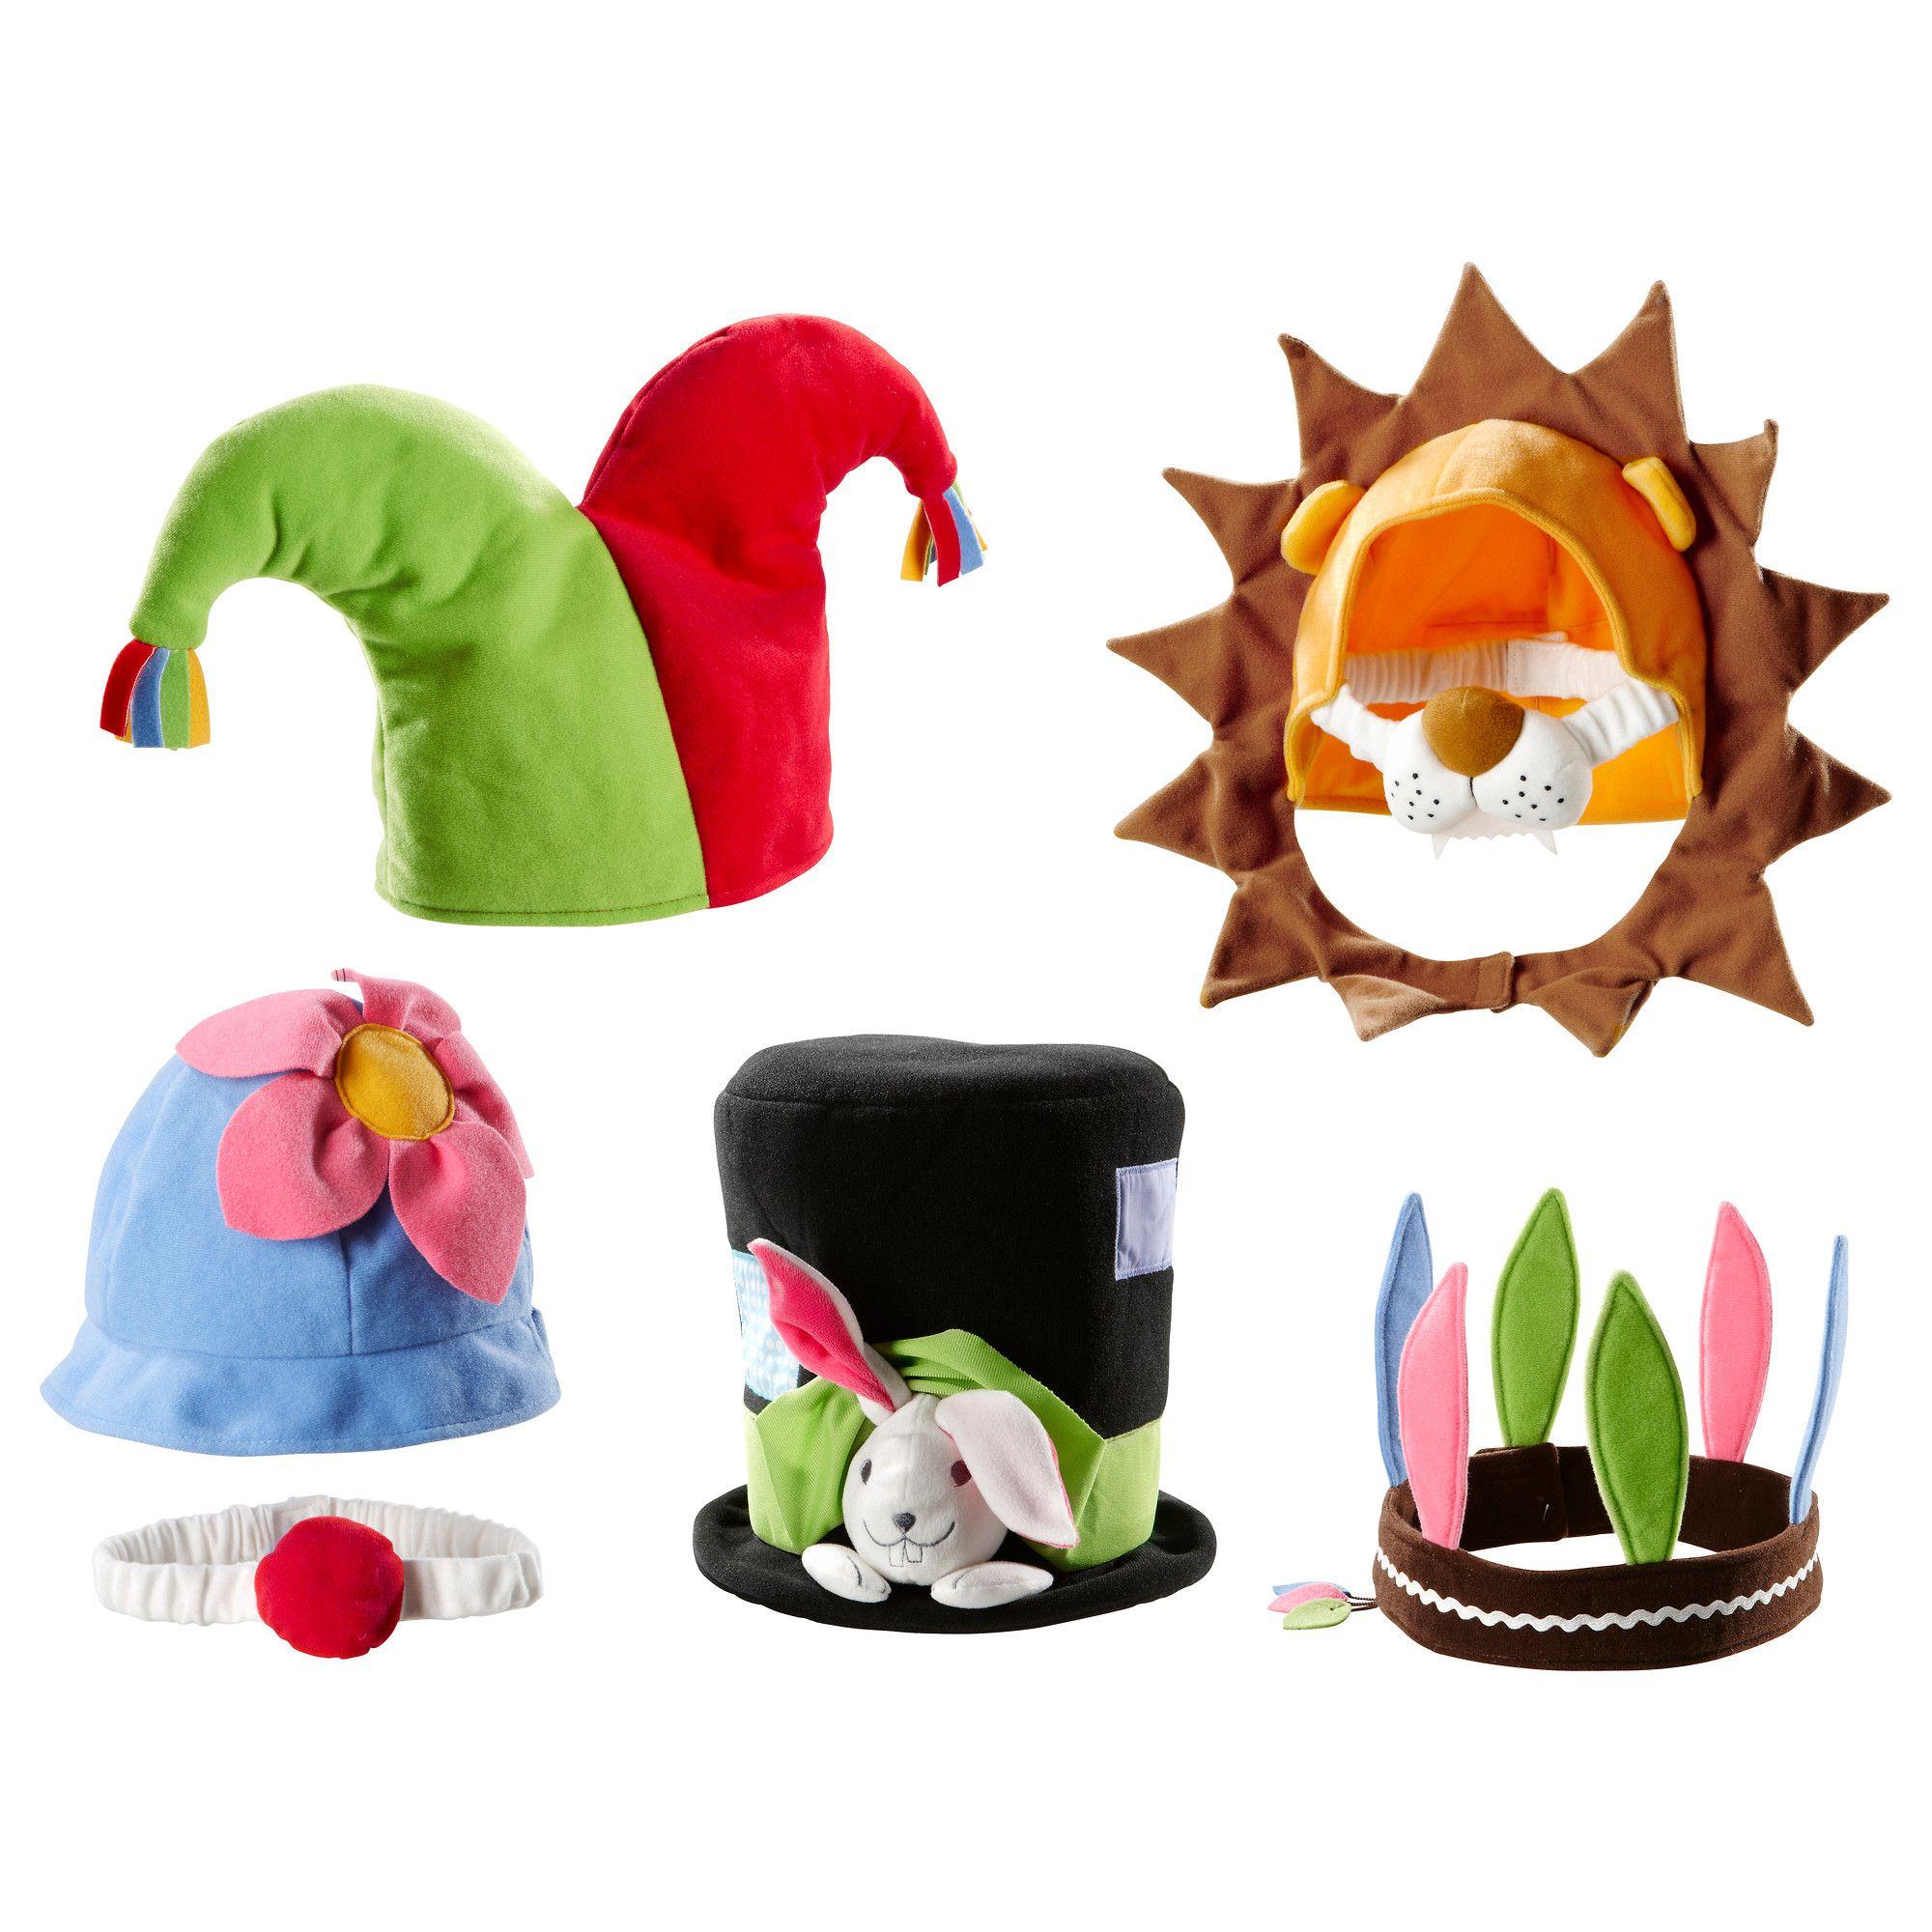 klappar cirkus hat ikea supplies pinterest ikea. Black Bedroom Furniture Sets. Home Design Ideas